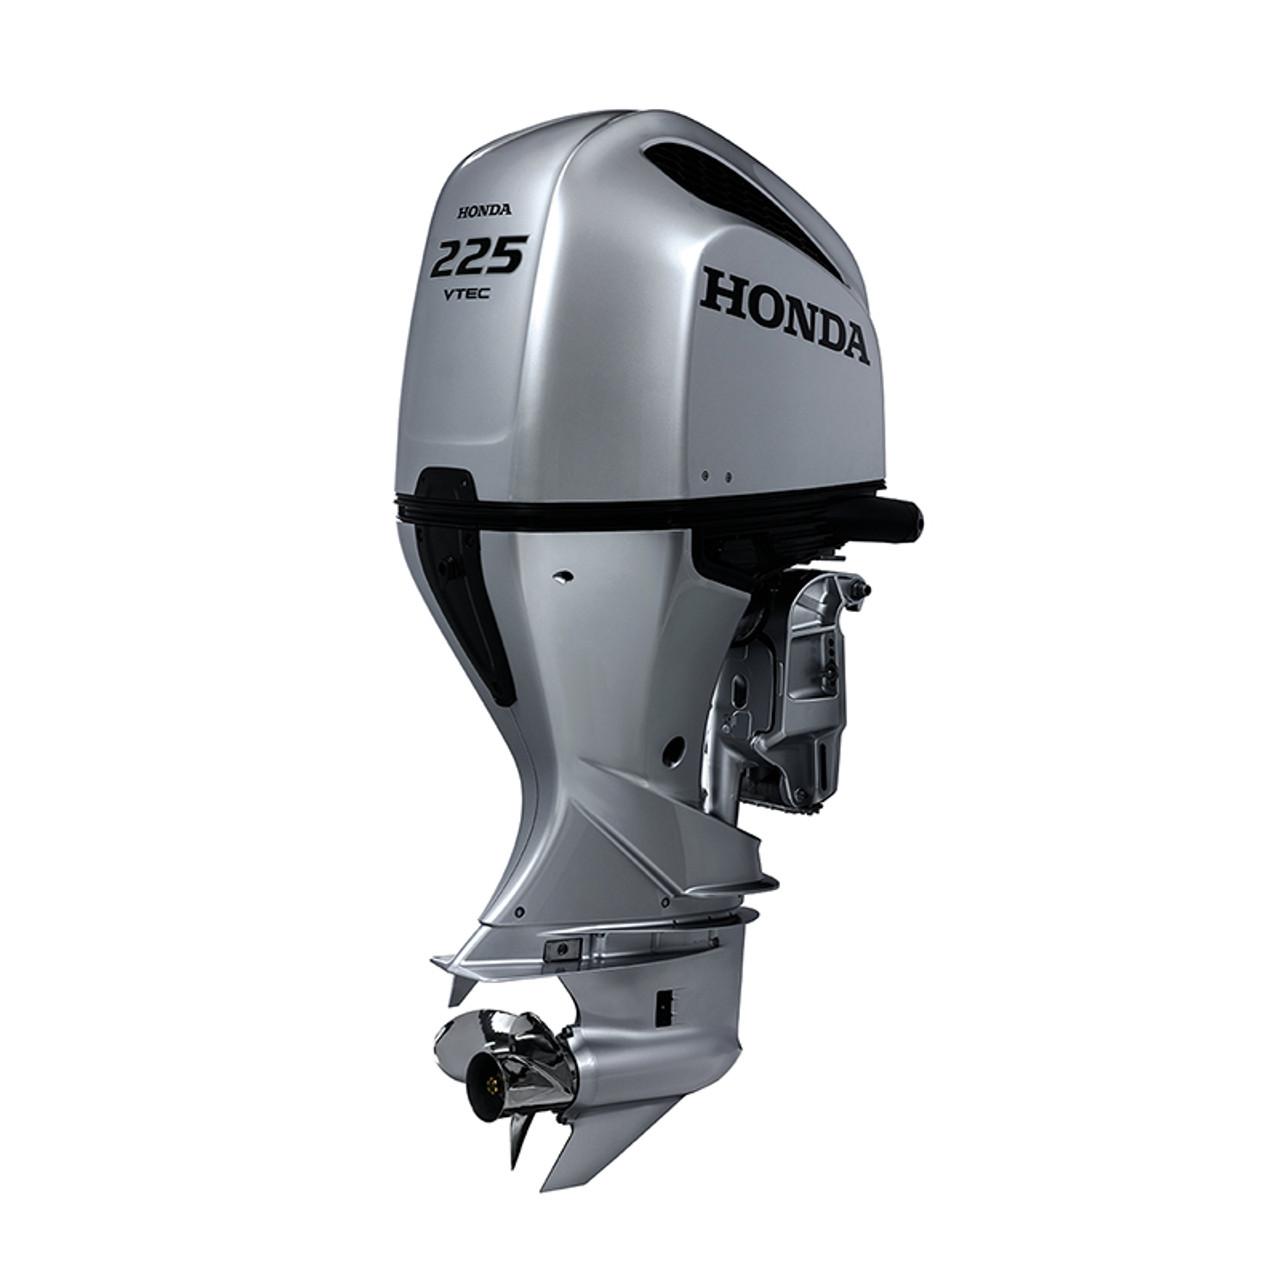 Honda BF225 mechanical shift 4 stroke outboard motor